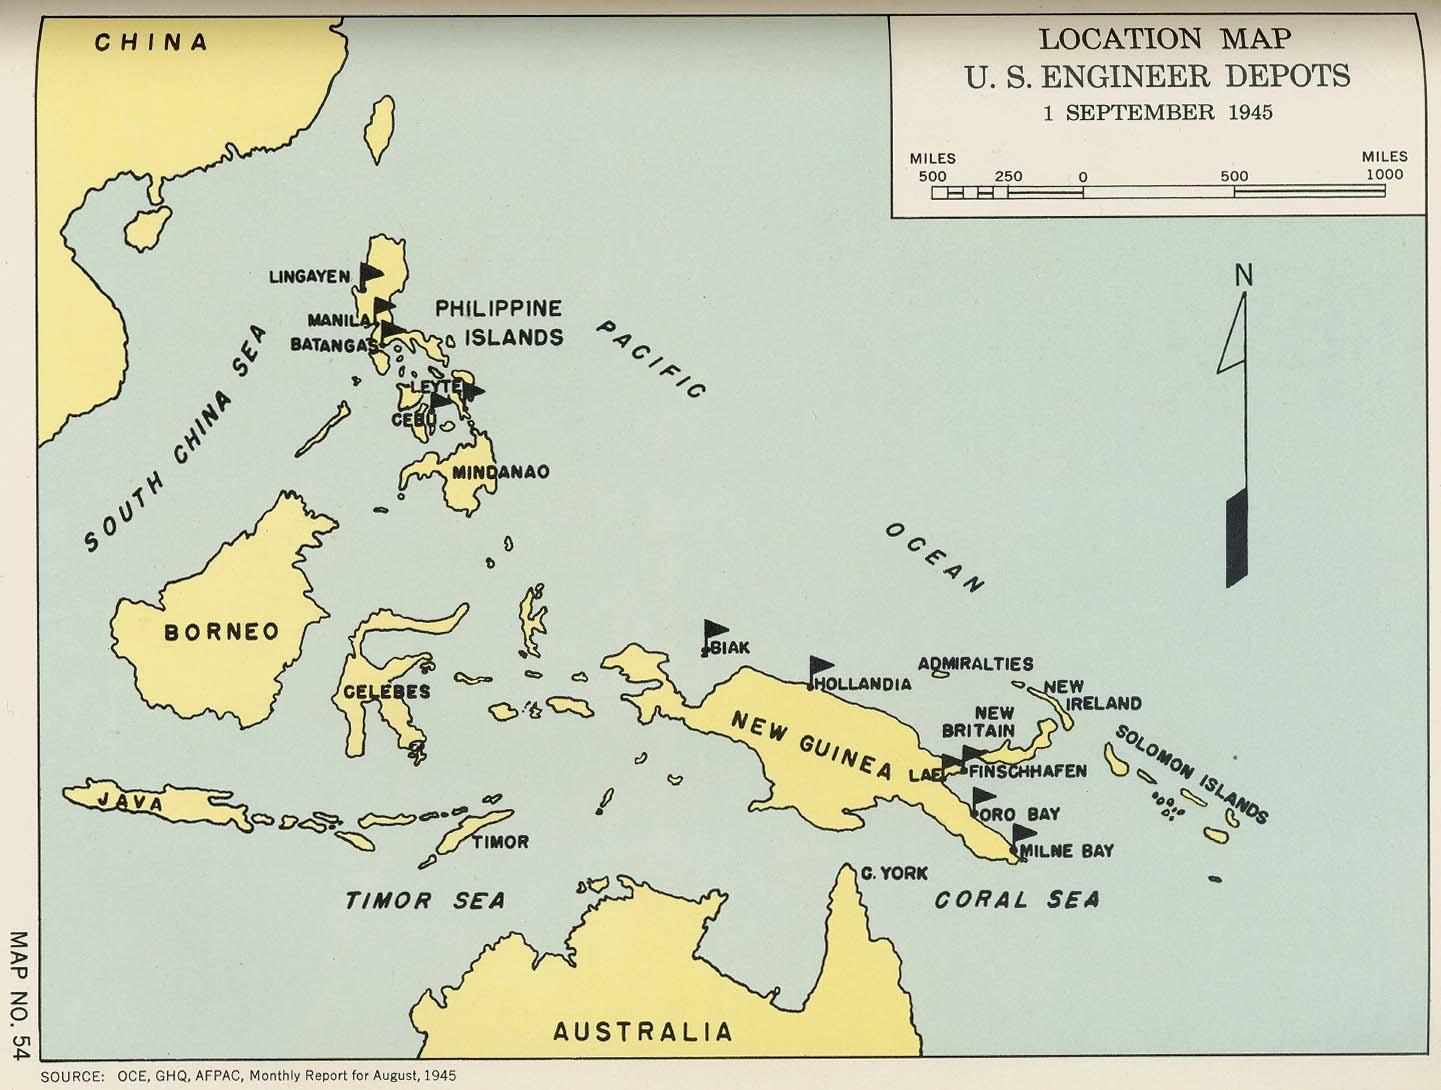 Location Map U S Engineer Depots 1 September 1945